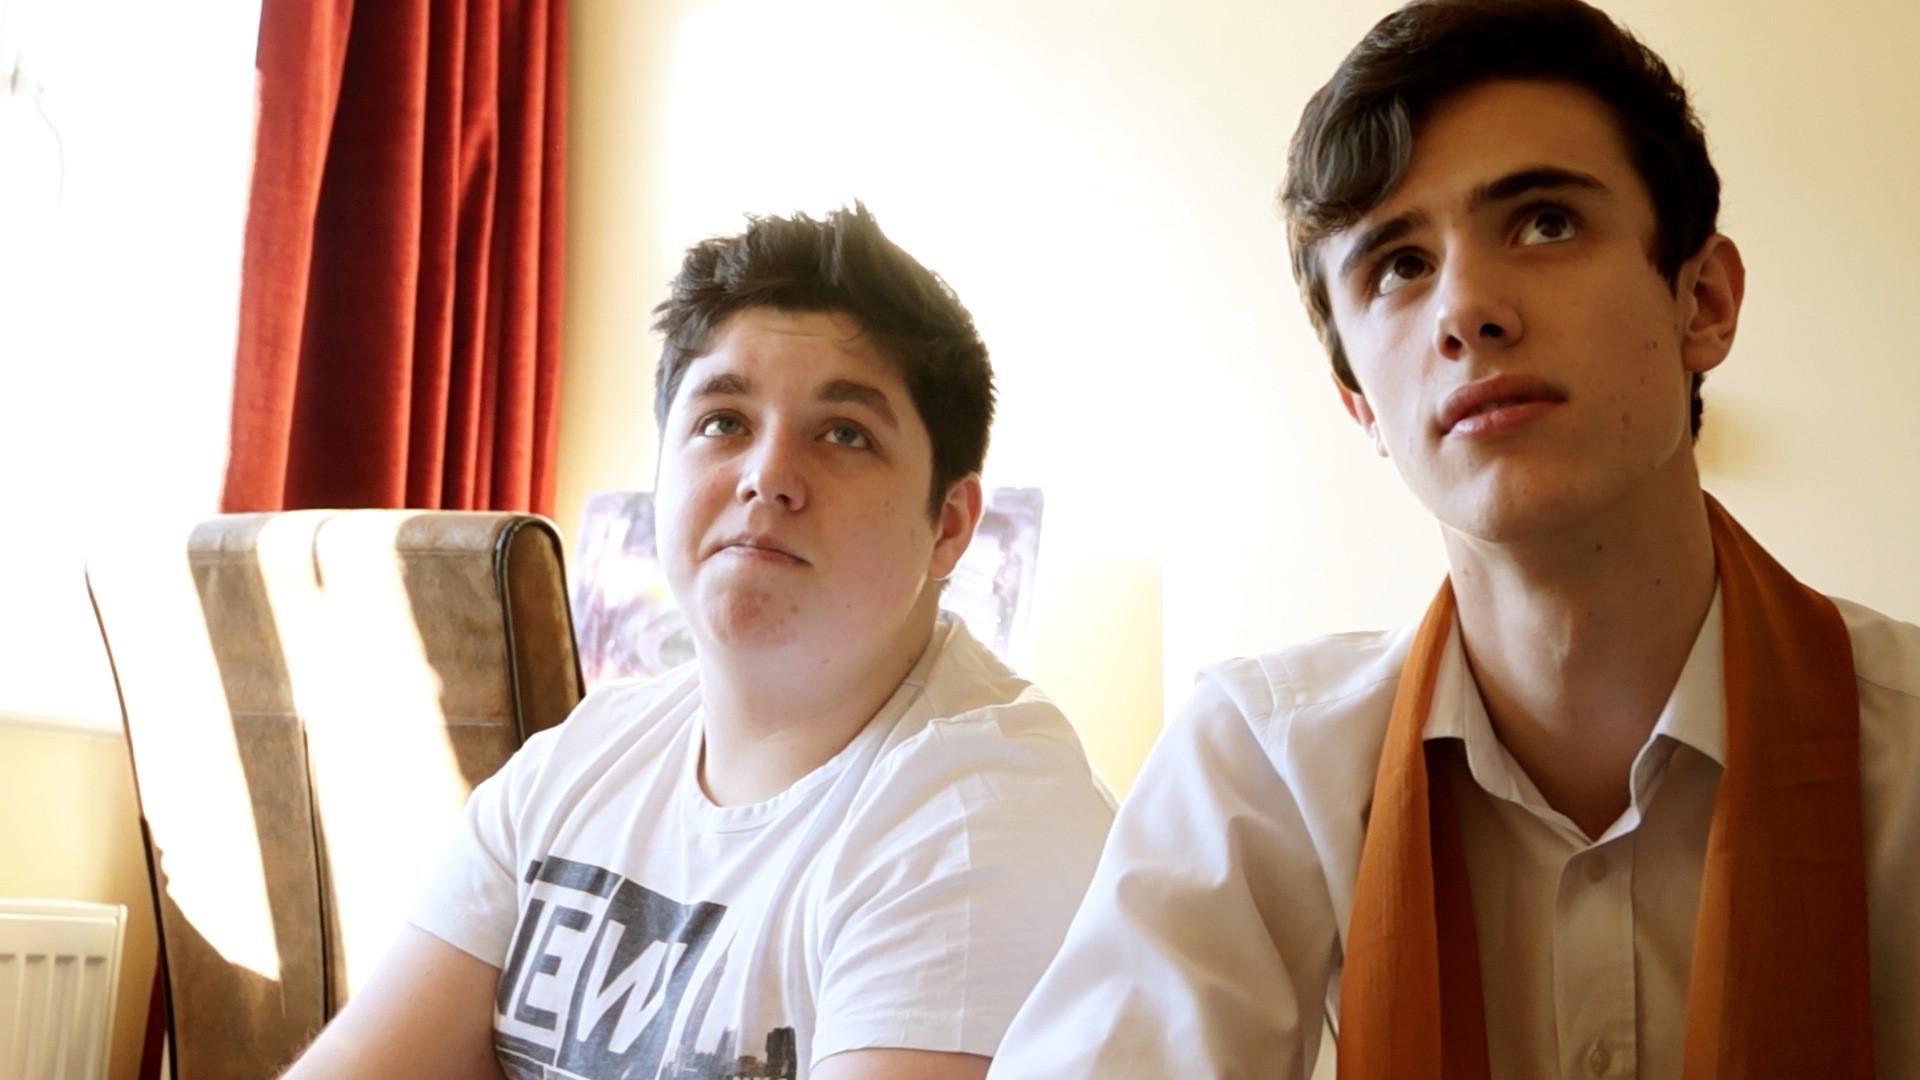 Jordan Cottle and Jack Stringer as Hugh Darvill and Barney Fields